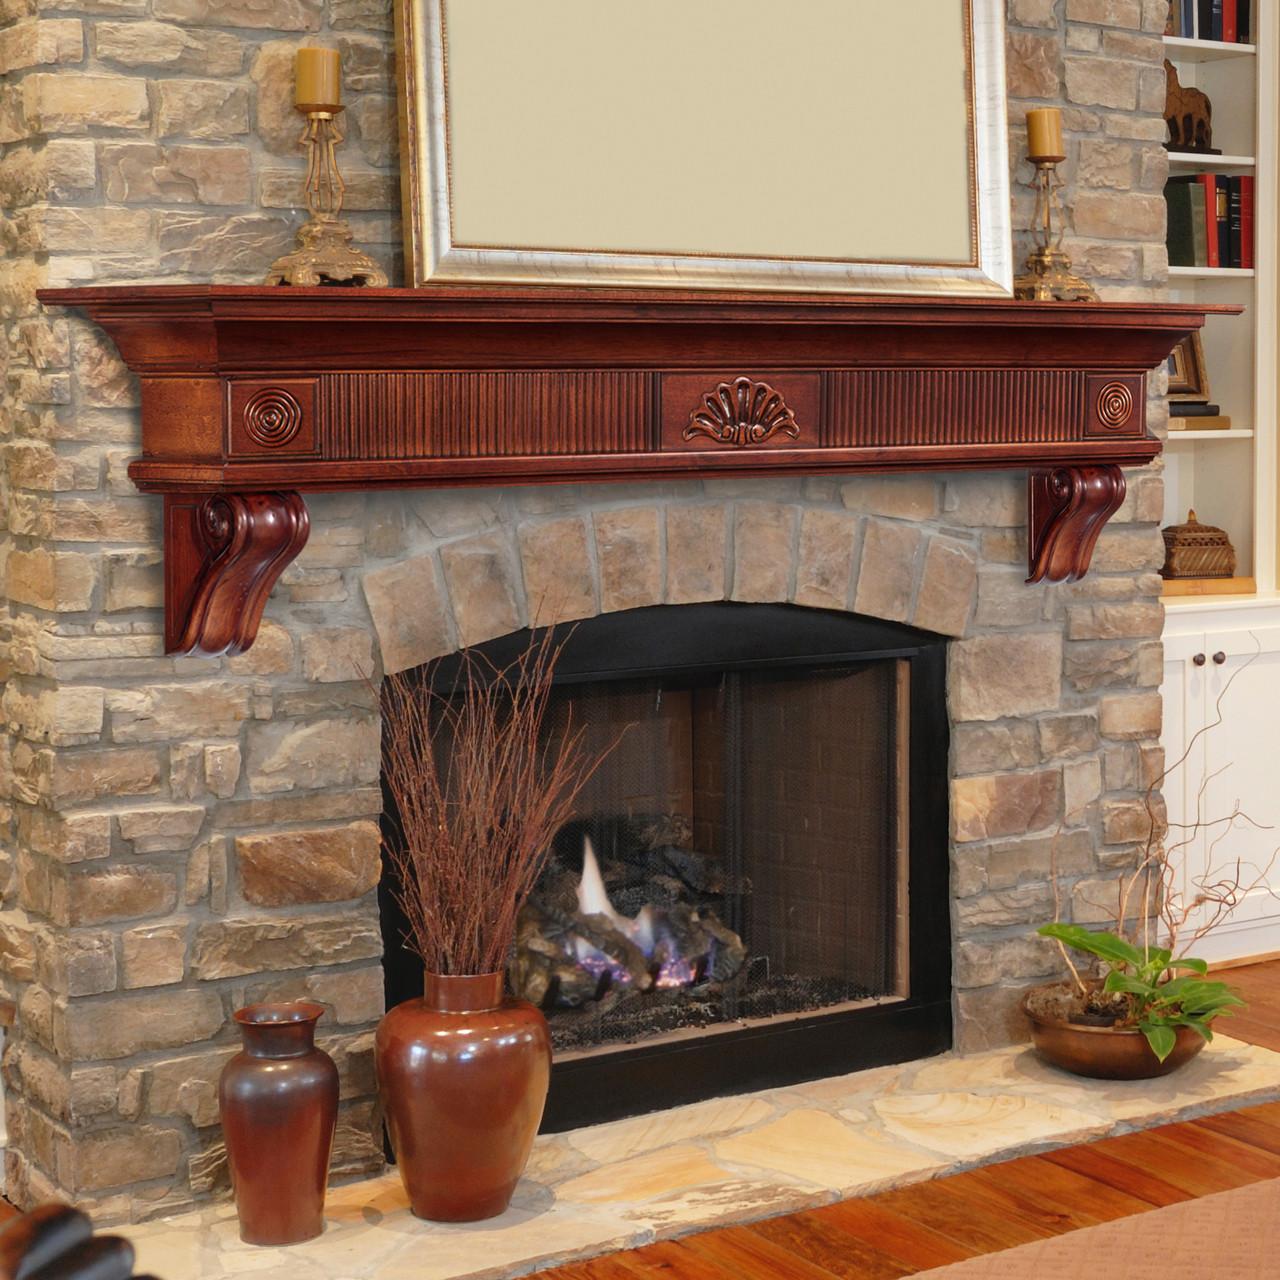 The Devonshire Mantel Shelf, Life Style View 2